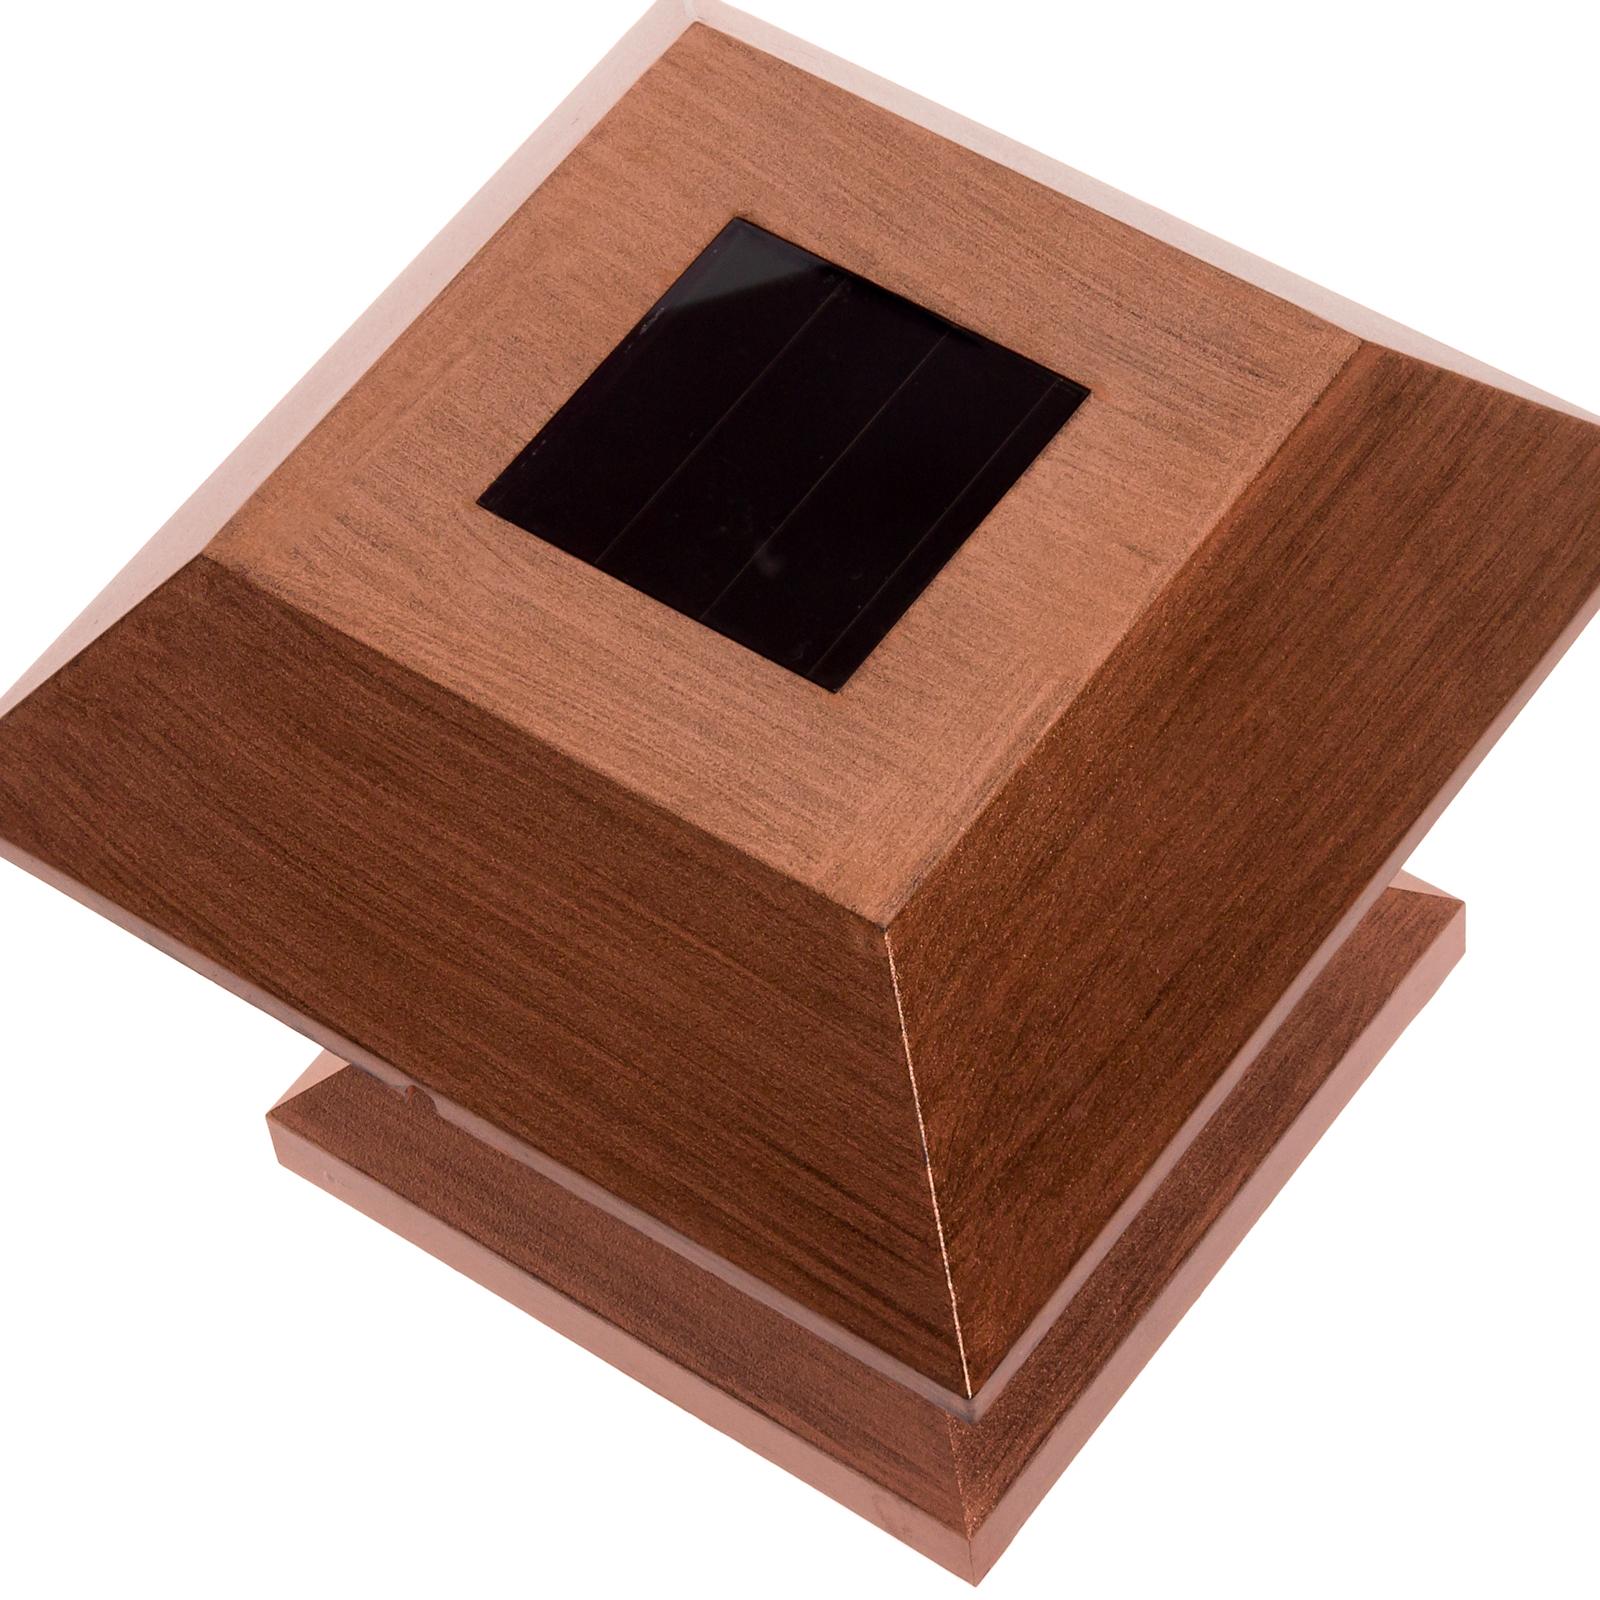 Outdoor Wooden Post Lights: GreenLighting Outdoor Summit Solar Post Cap Light For 4x4